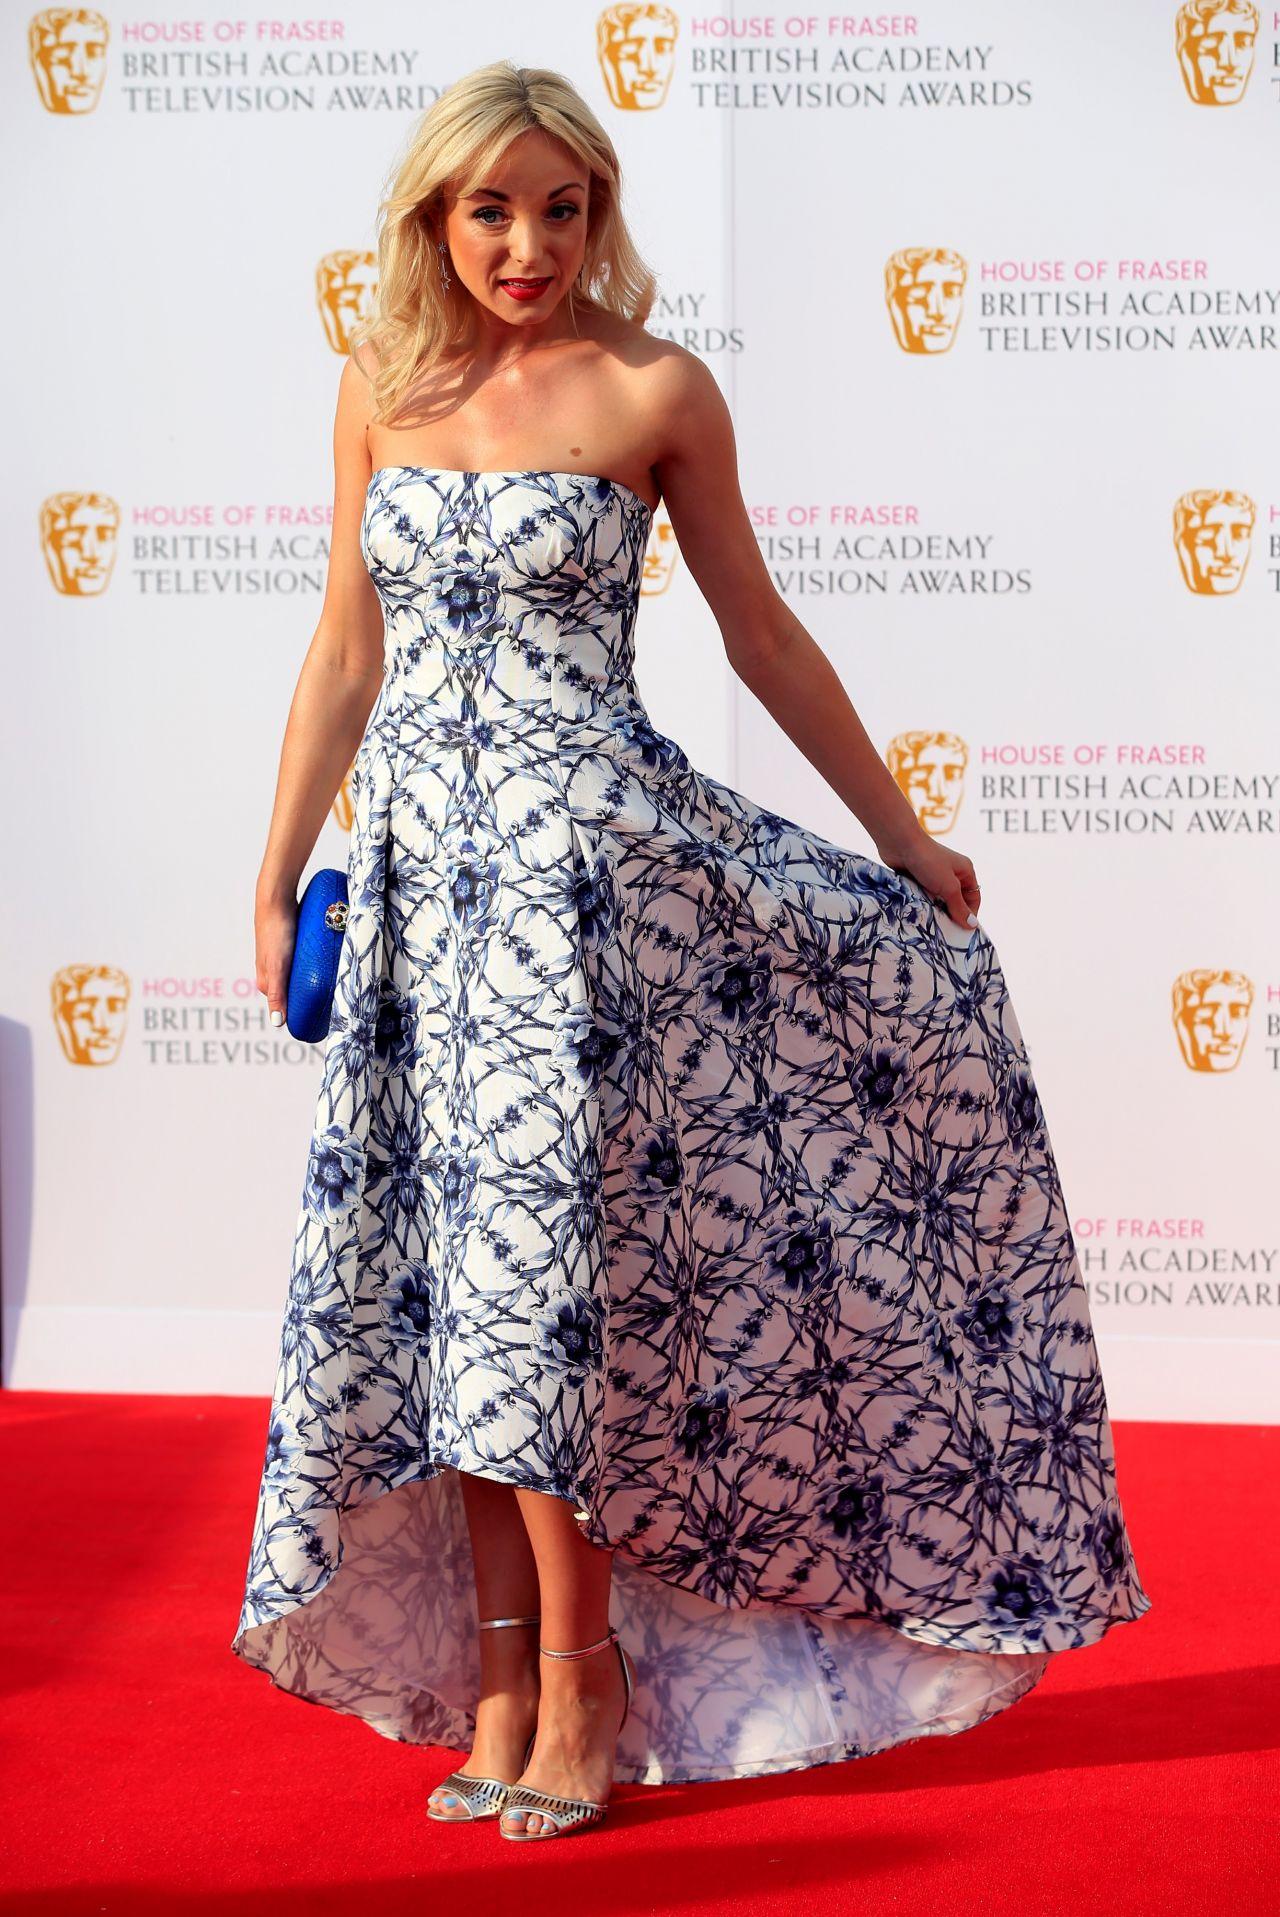 British Academy Television Awards BAFTAS